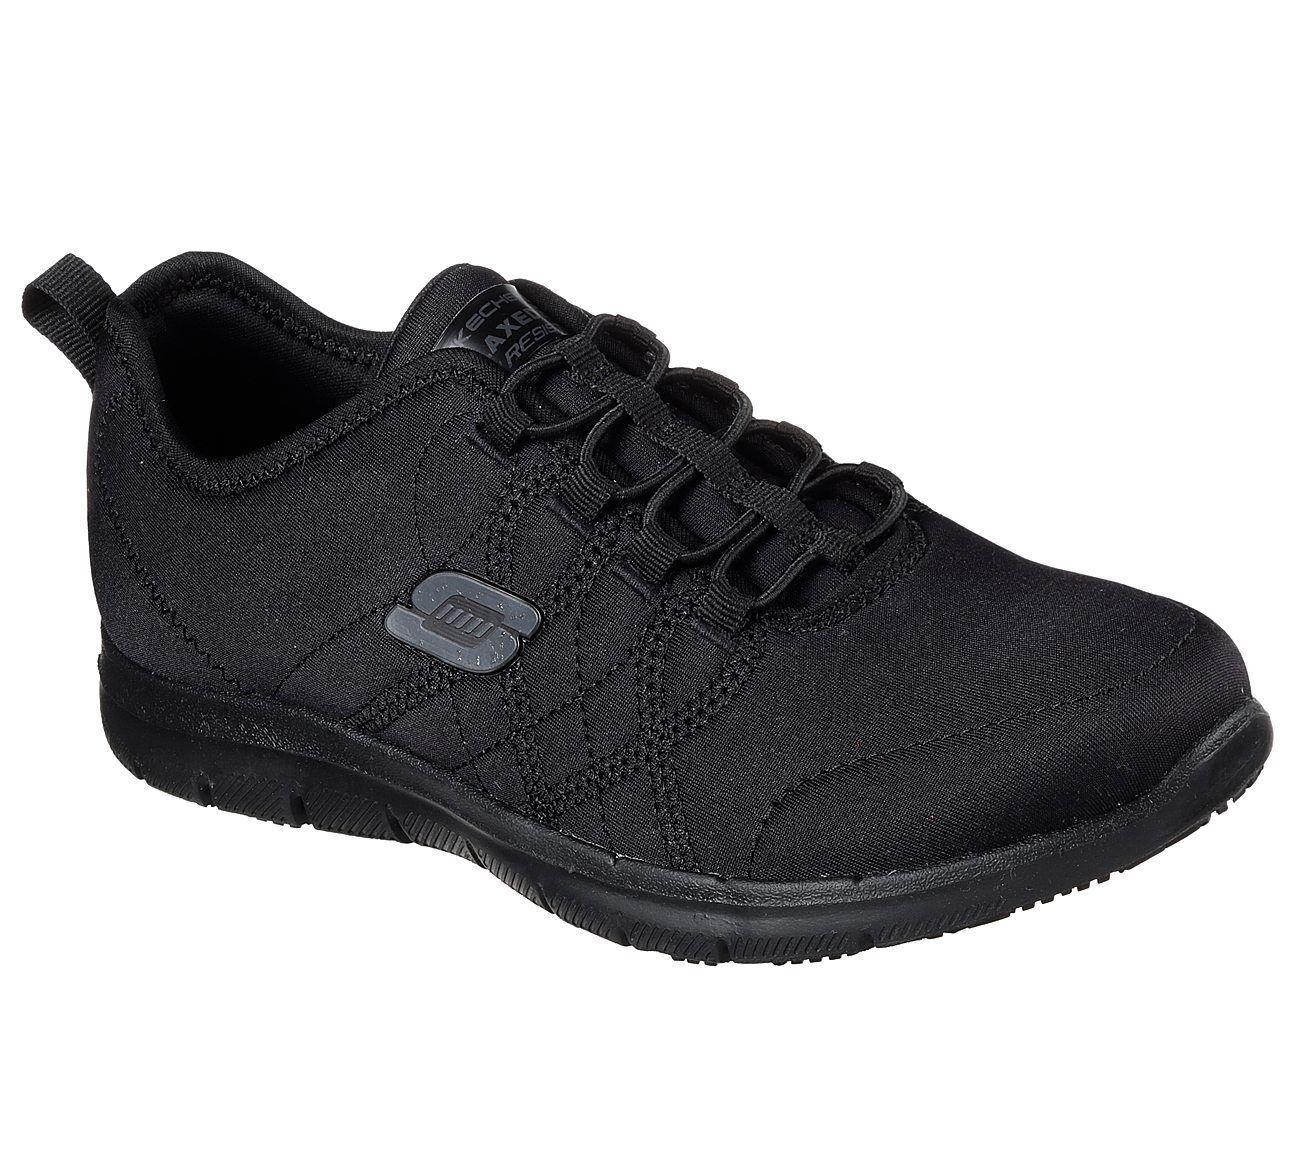 Black Skechers Shoes Women Memory Foam Work Slip Resistant Comfort Jersey